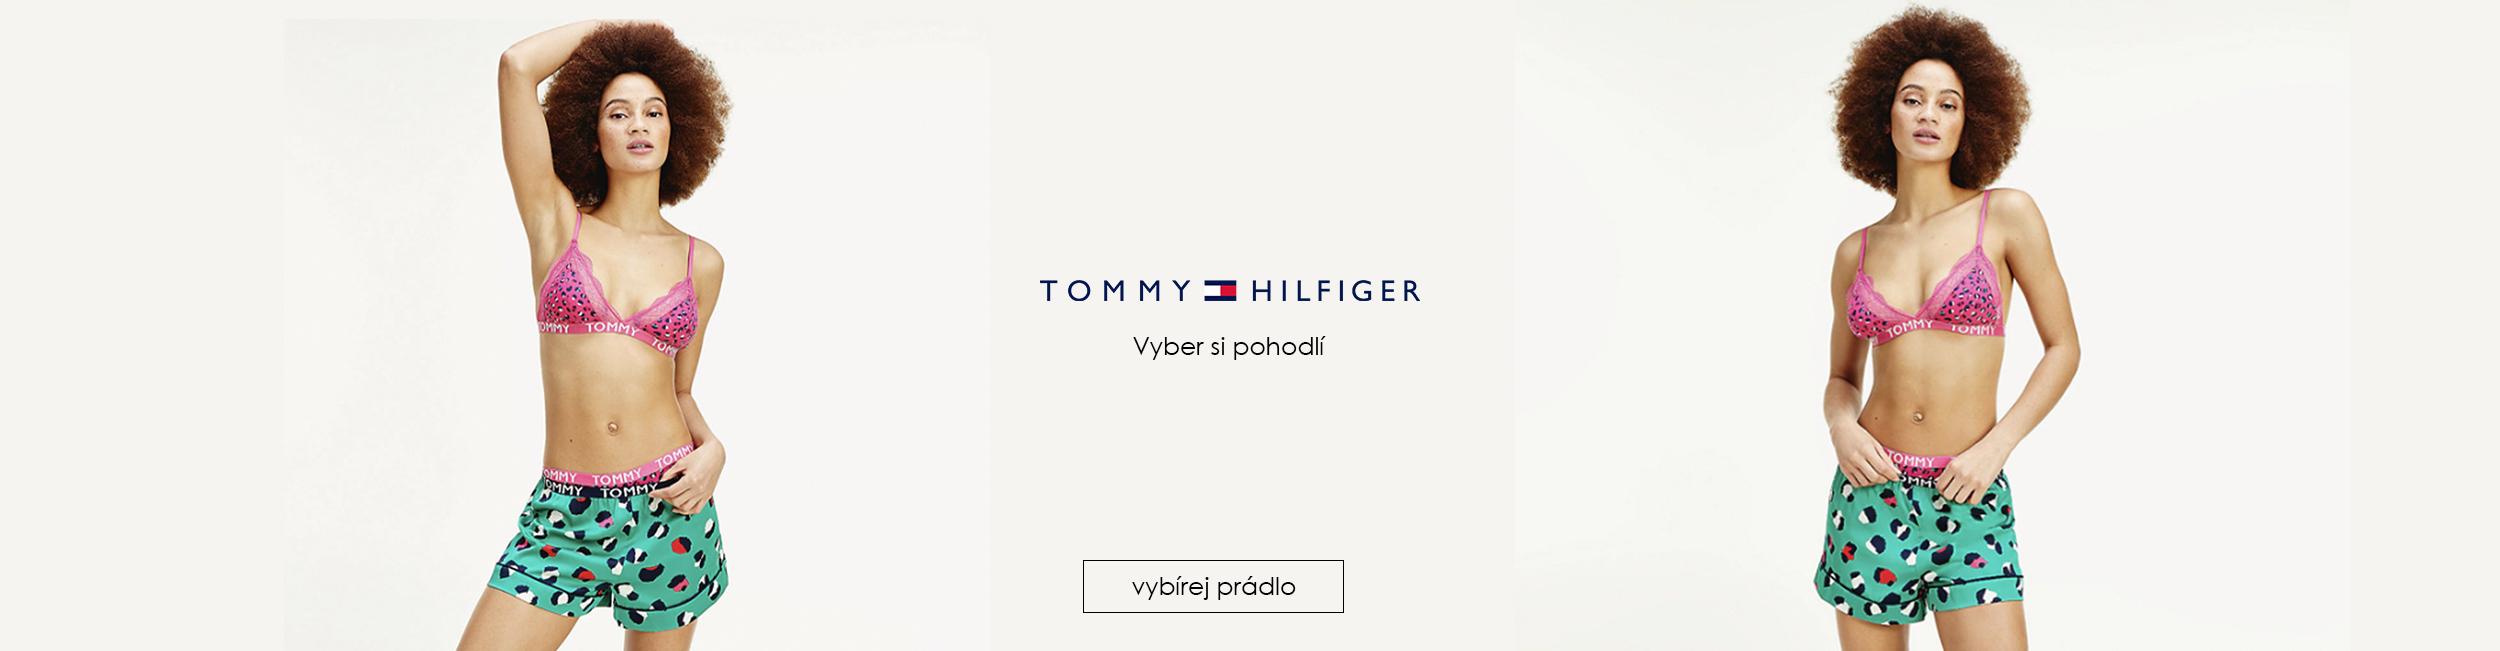 Spodni pradlo Tommy Hilfiger